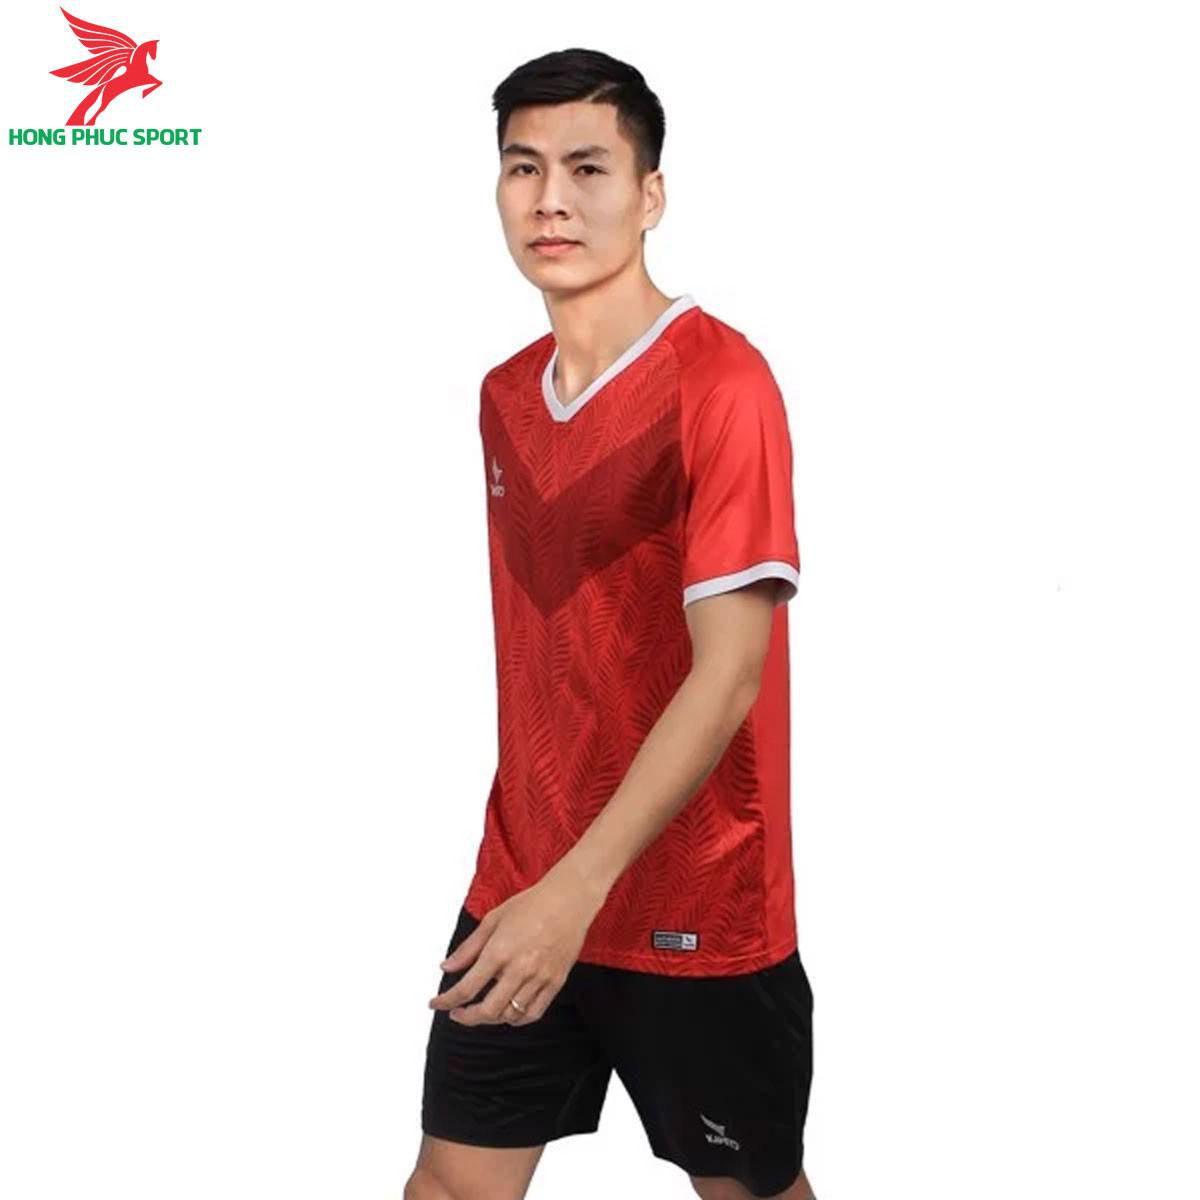 https://cdn.hongphucsport.com/unsafe/s4.shopbay.vn/files/285/ao-khong-logo-kamito-msh2102-mau-do-3-6052dcb058890.jpg